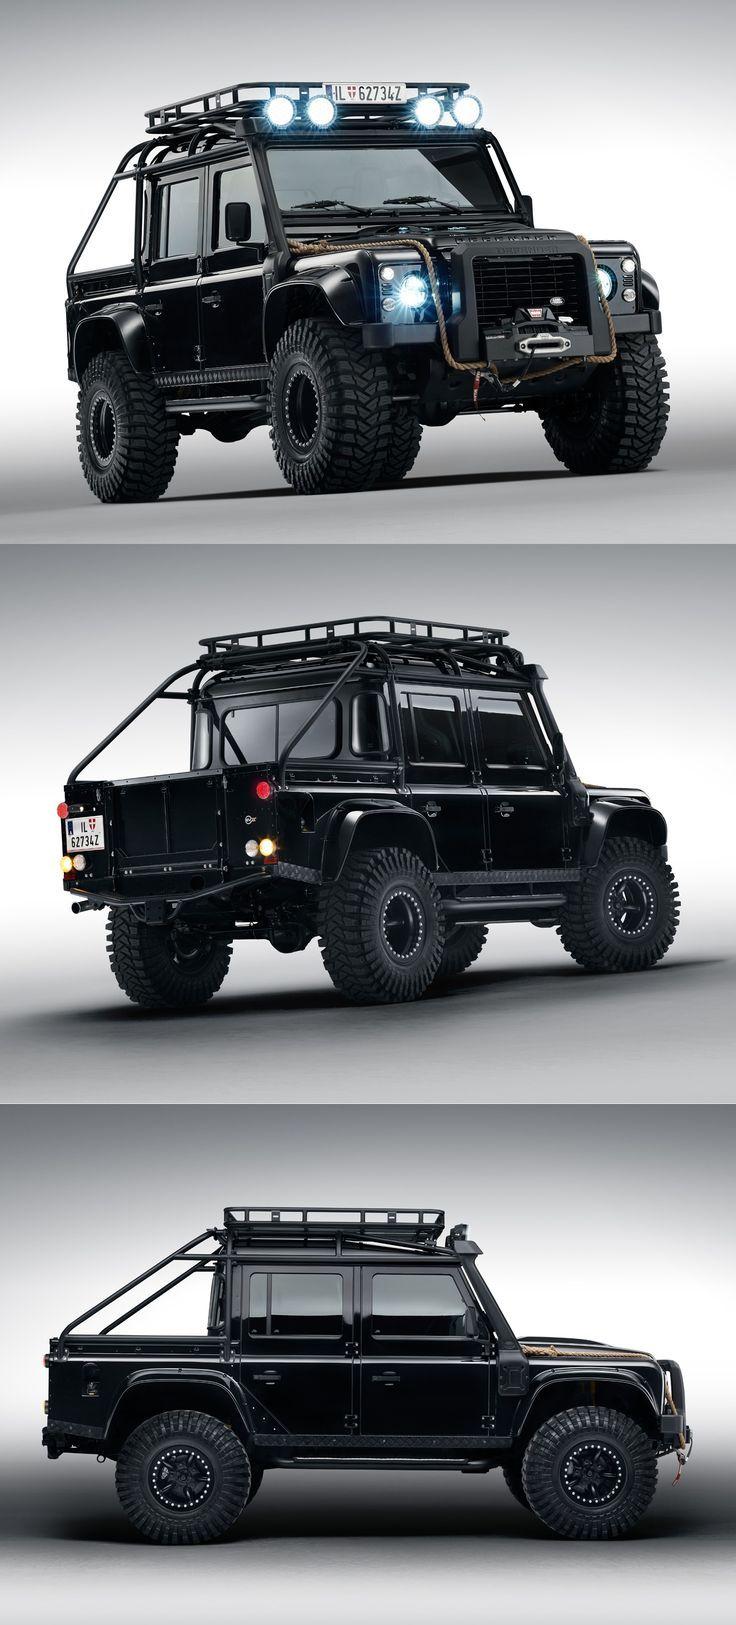 Land Rover Defender from James Bond Spectre  https://www.customautotrim.com/